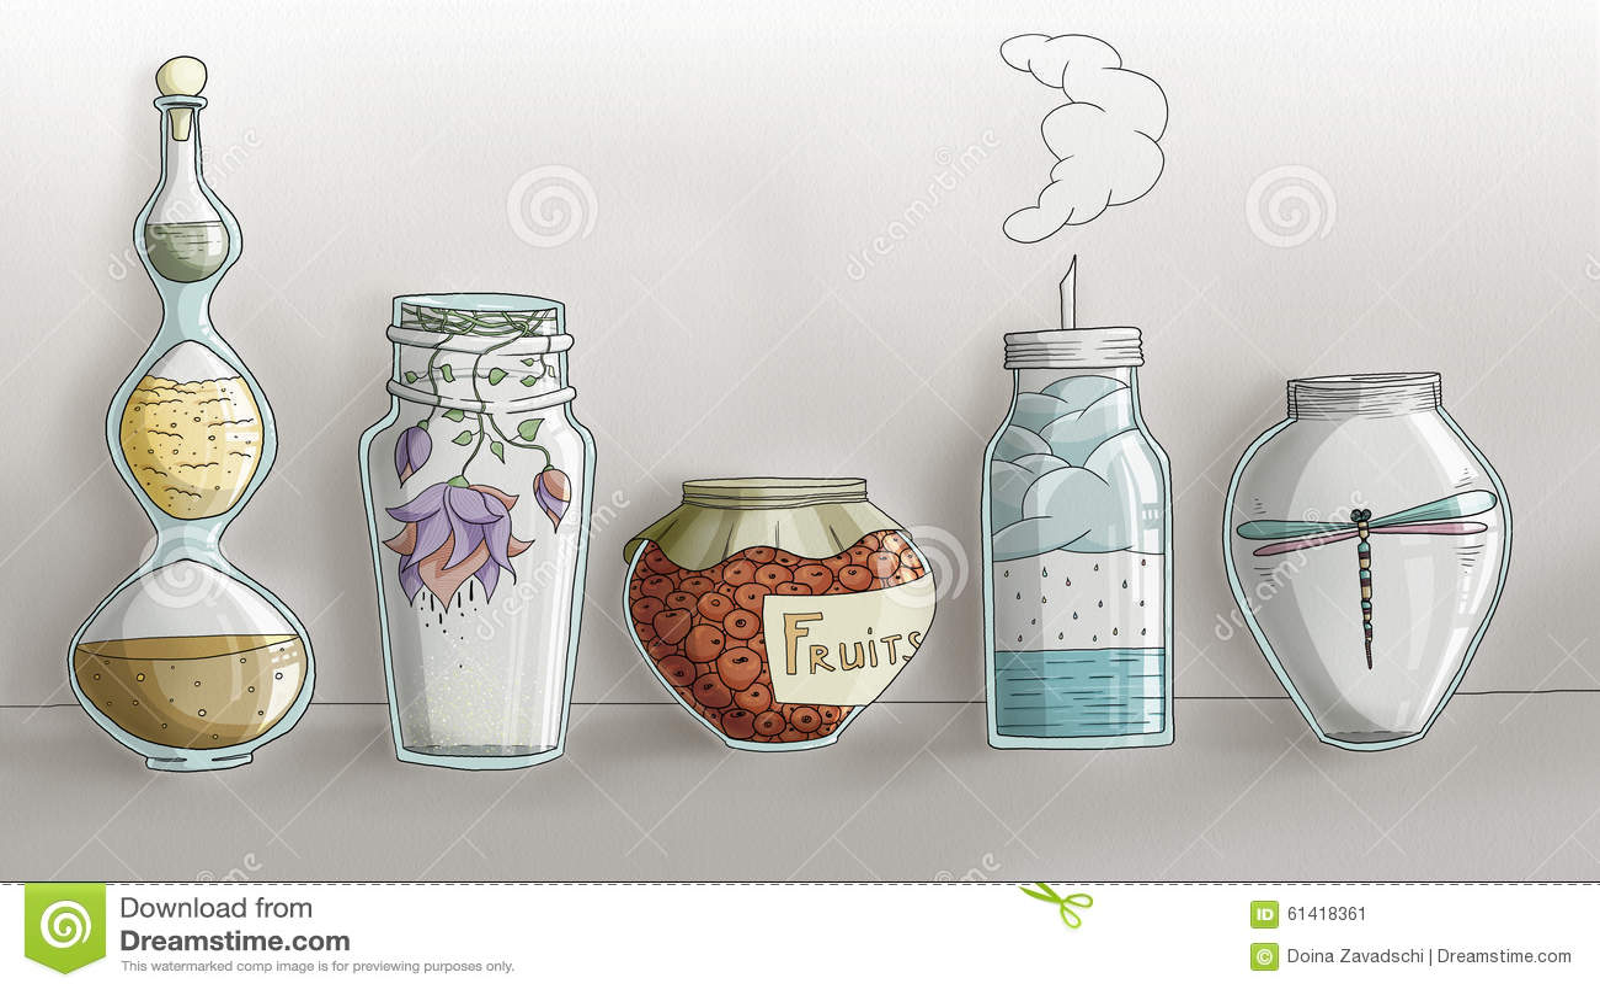 Strange Magic Kitchen Jars - digital hand drawn